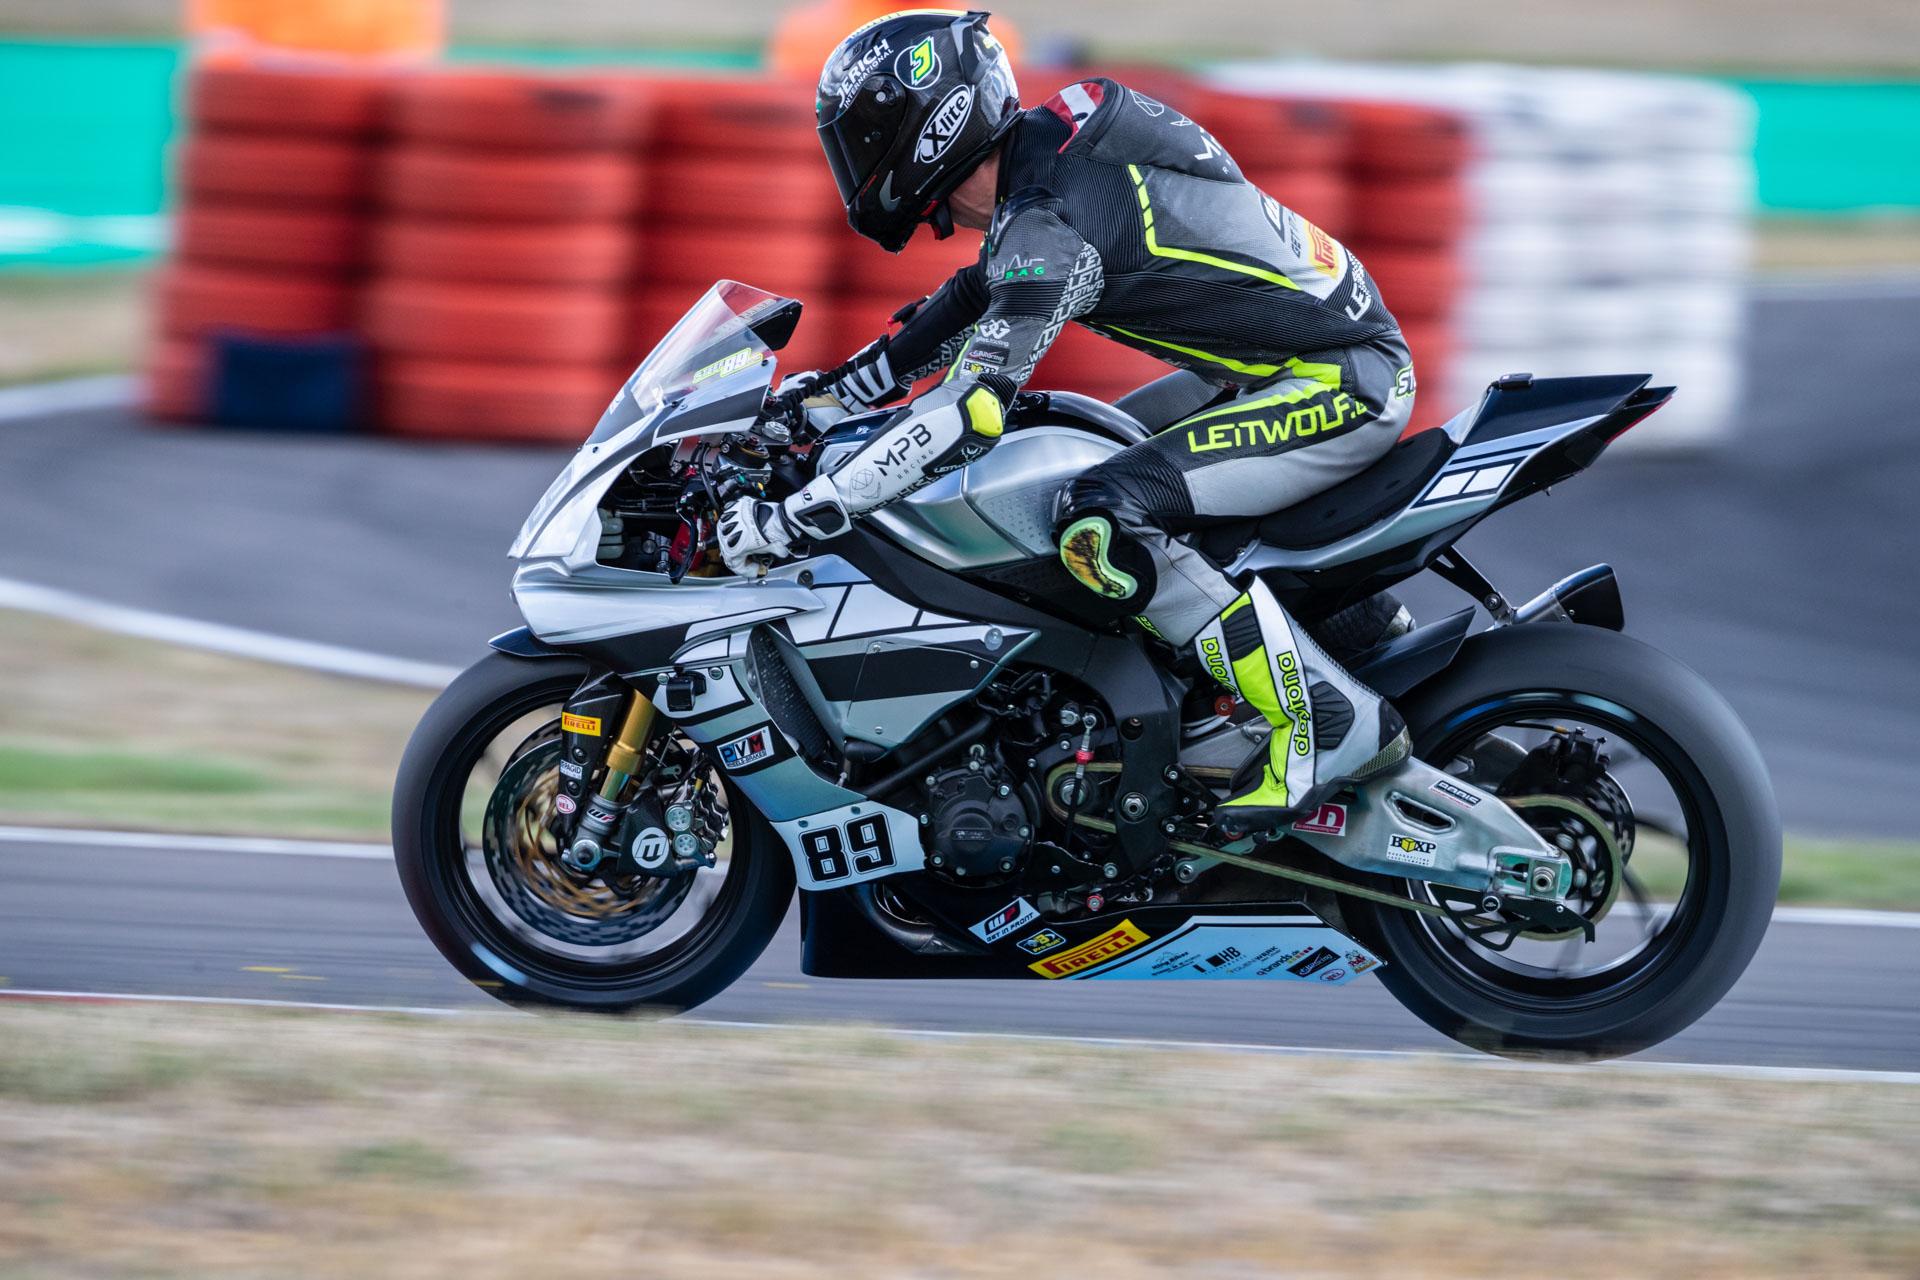 idm-sbk_rennen1_lausitzring2018-46